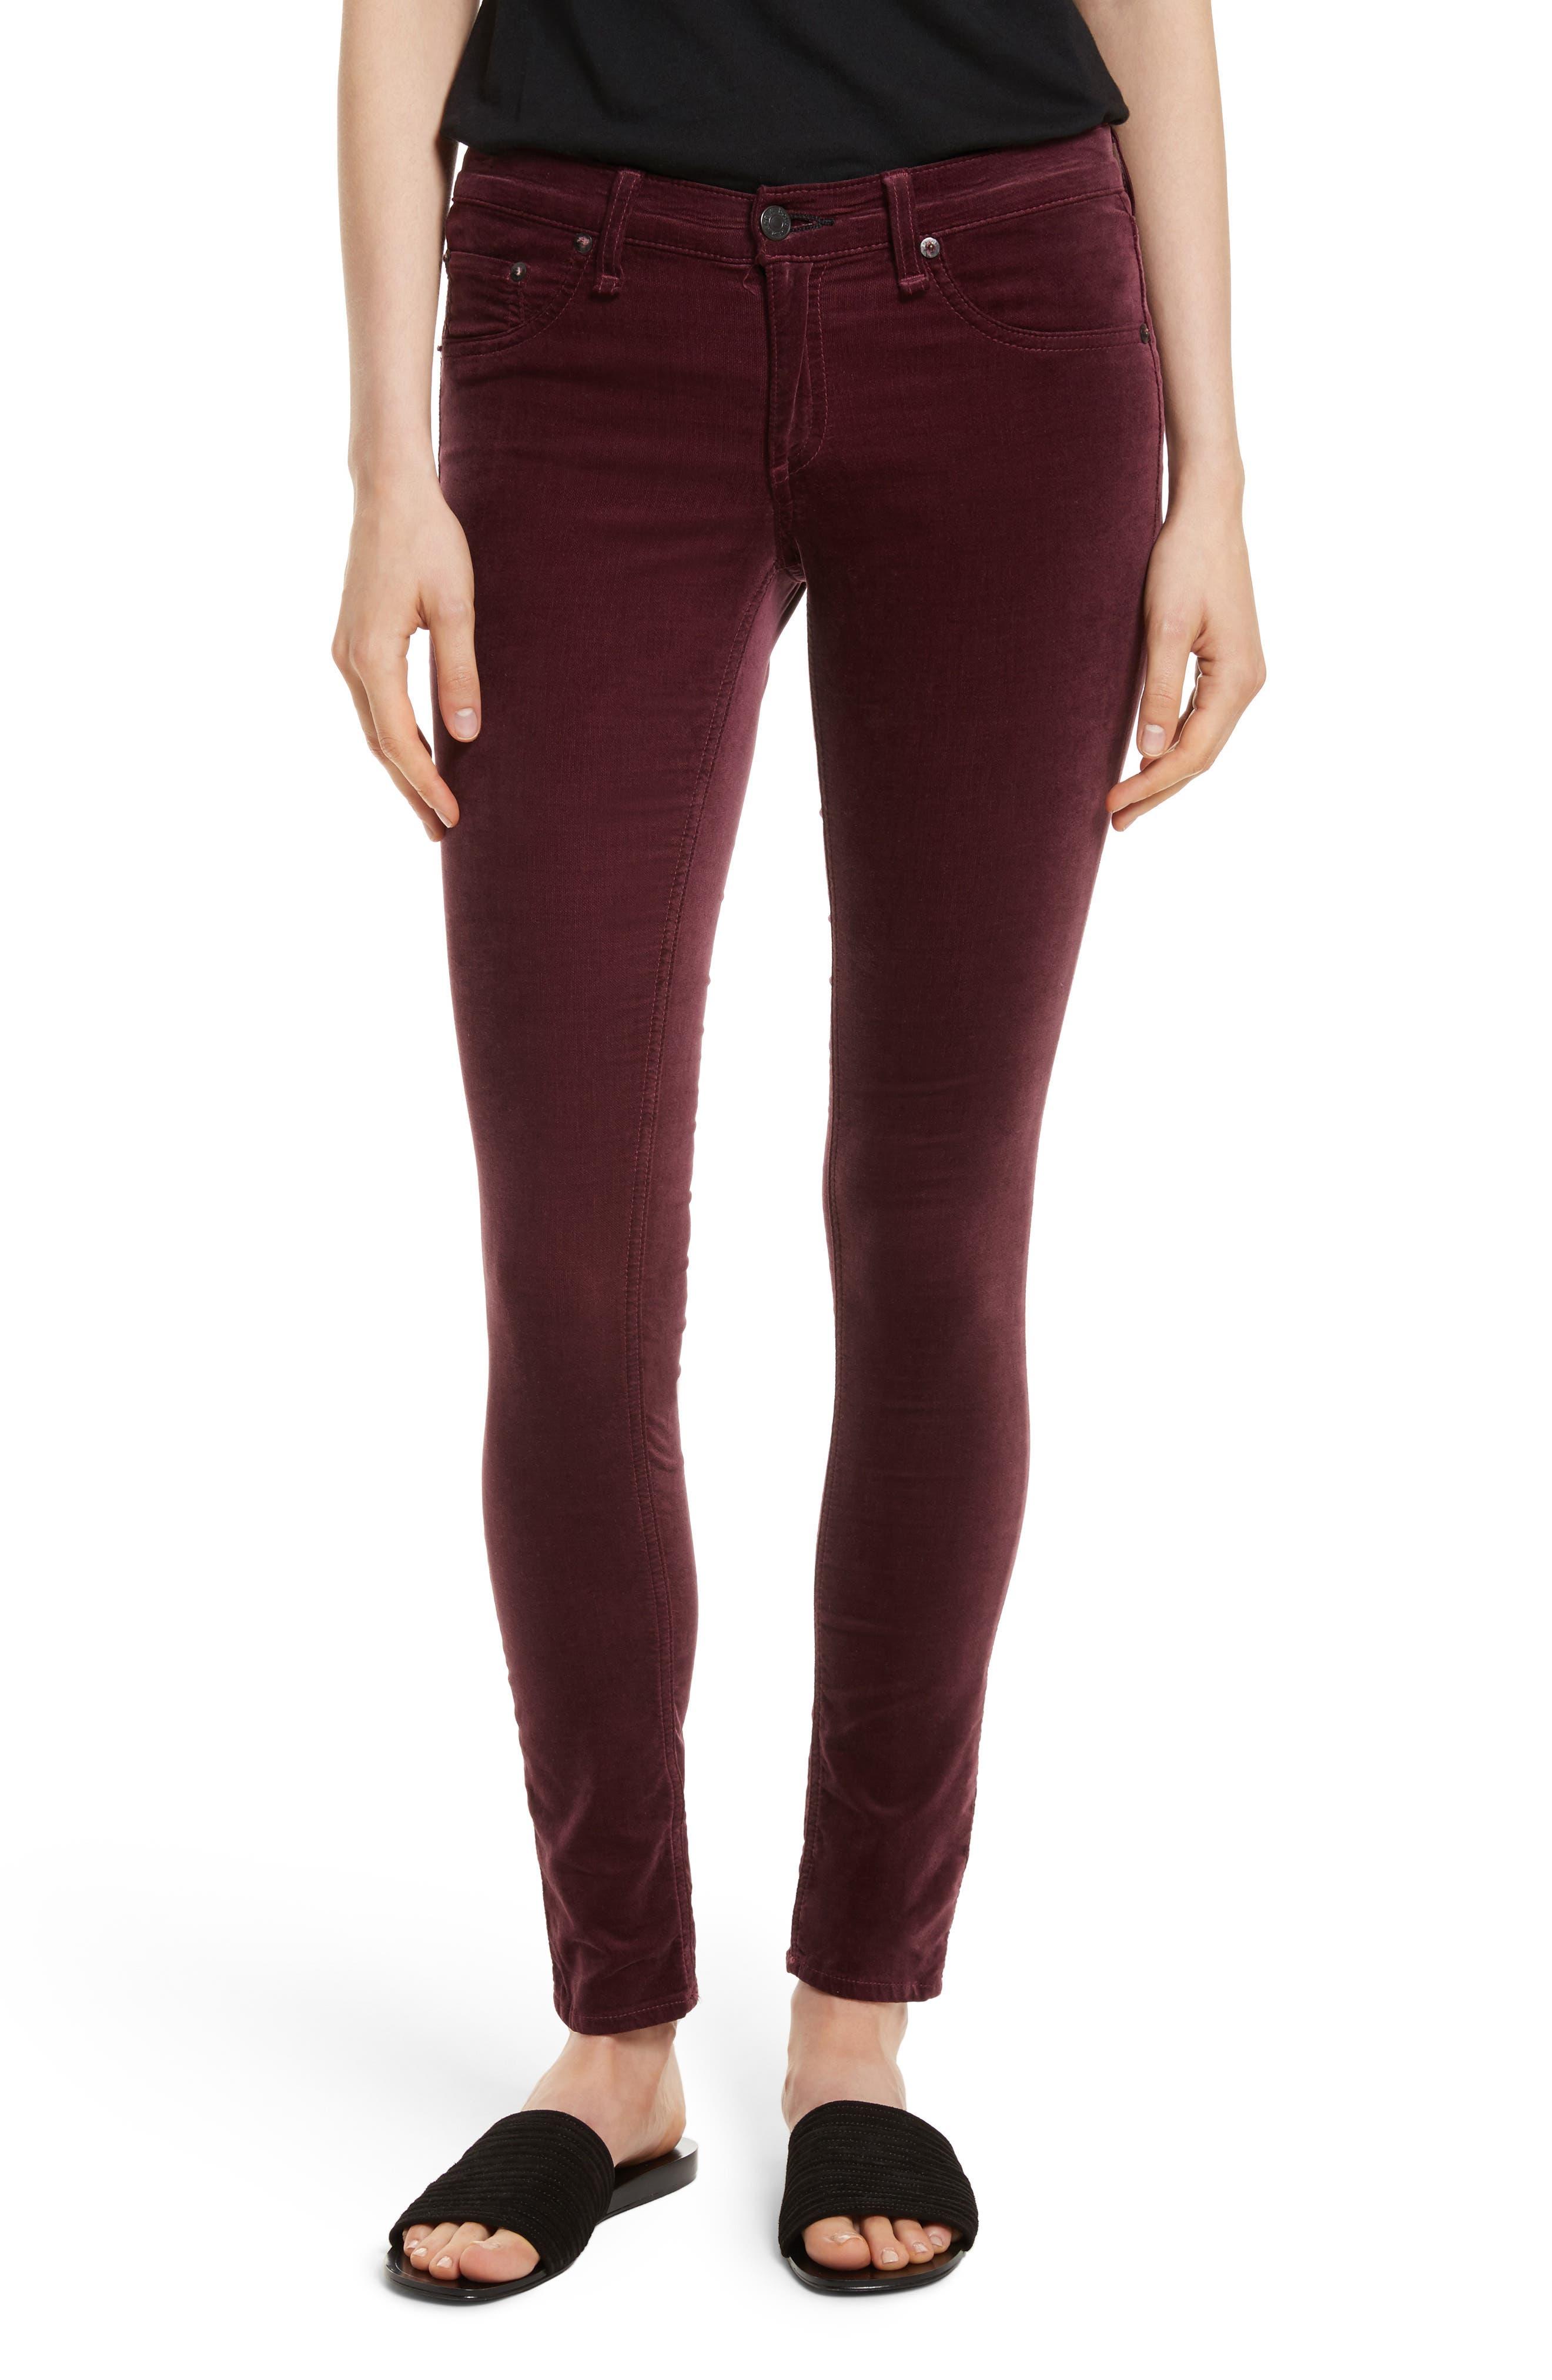 Alternate Image 1 Selected - rag & bone/JEAN Velvet Skinny Jeans